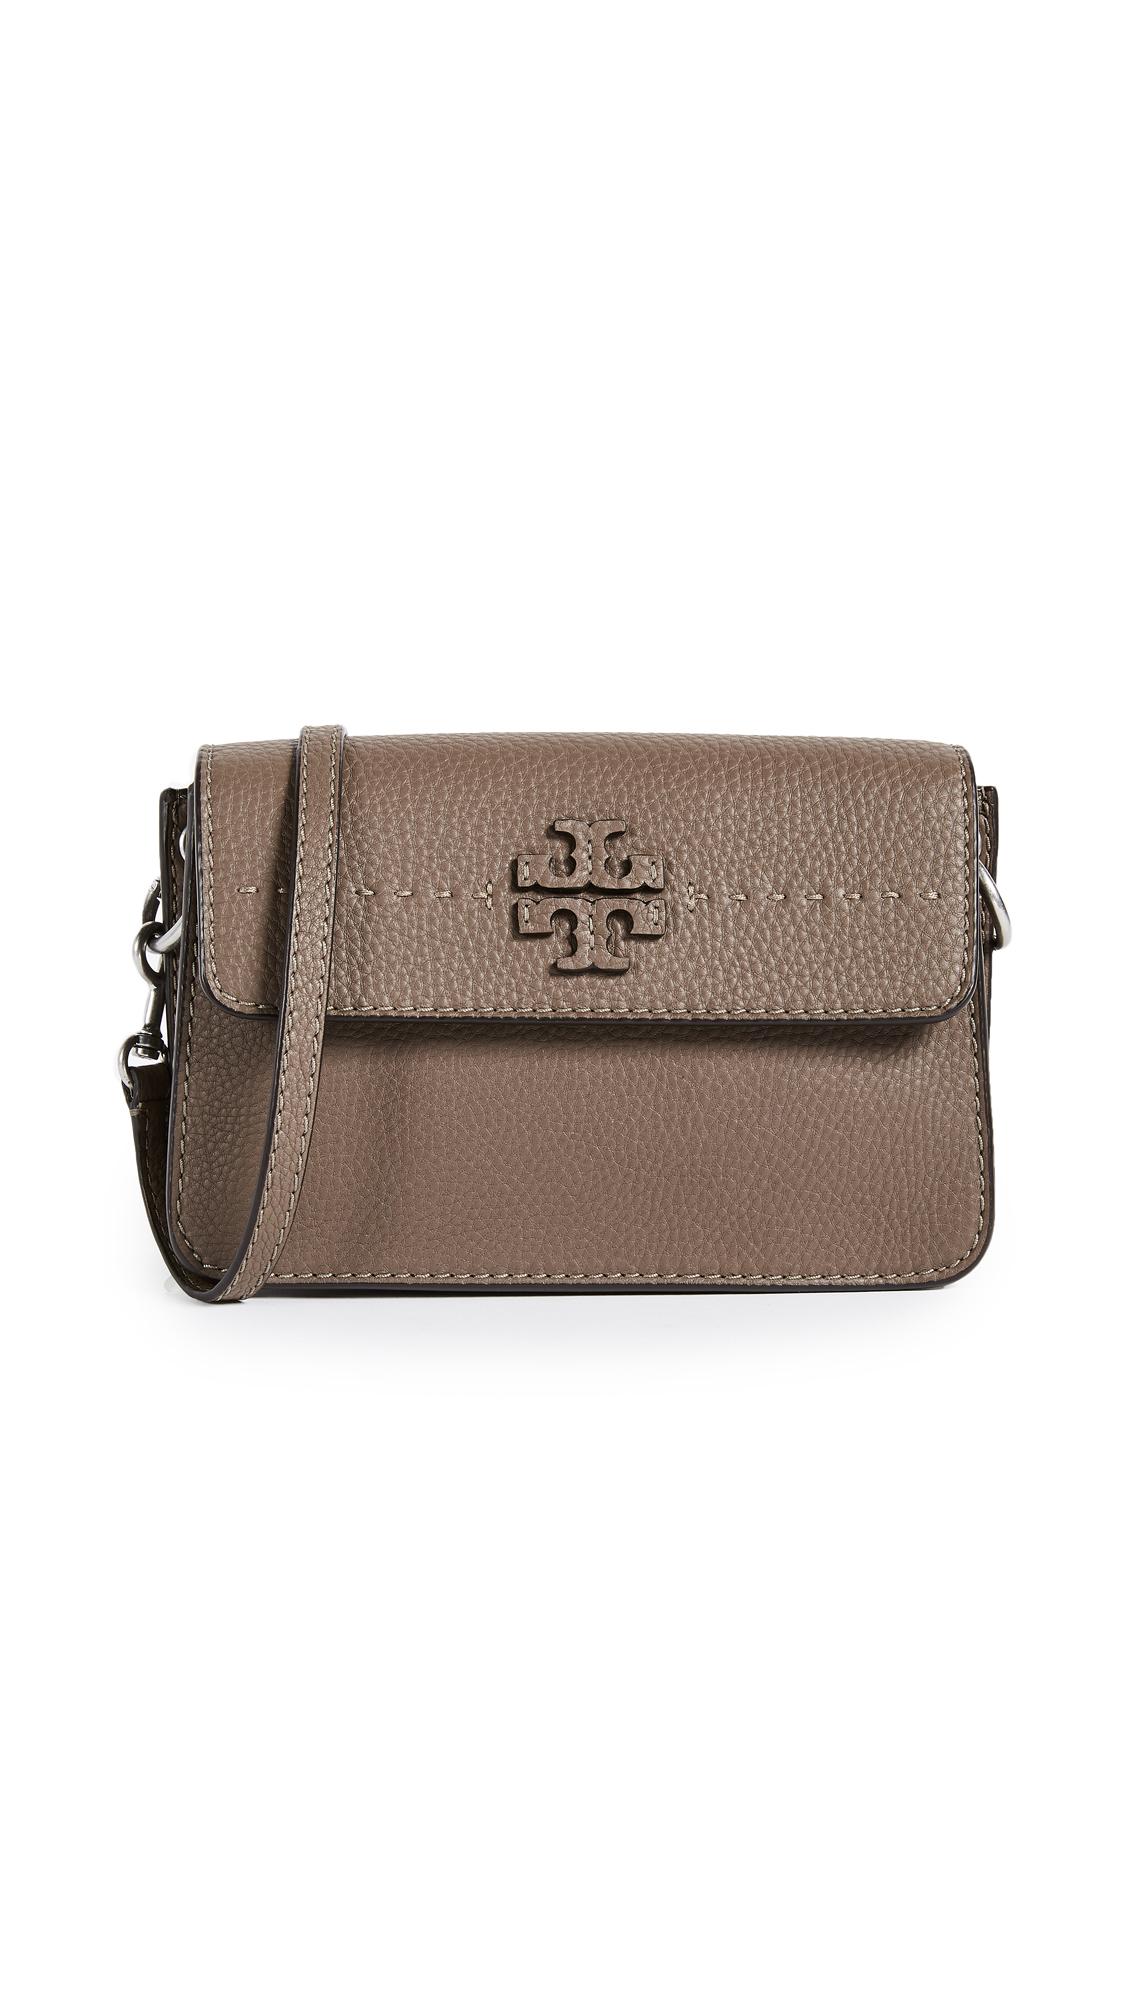 Tory Burch McGraw Cross Body Bag - Silver Maple